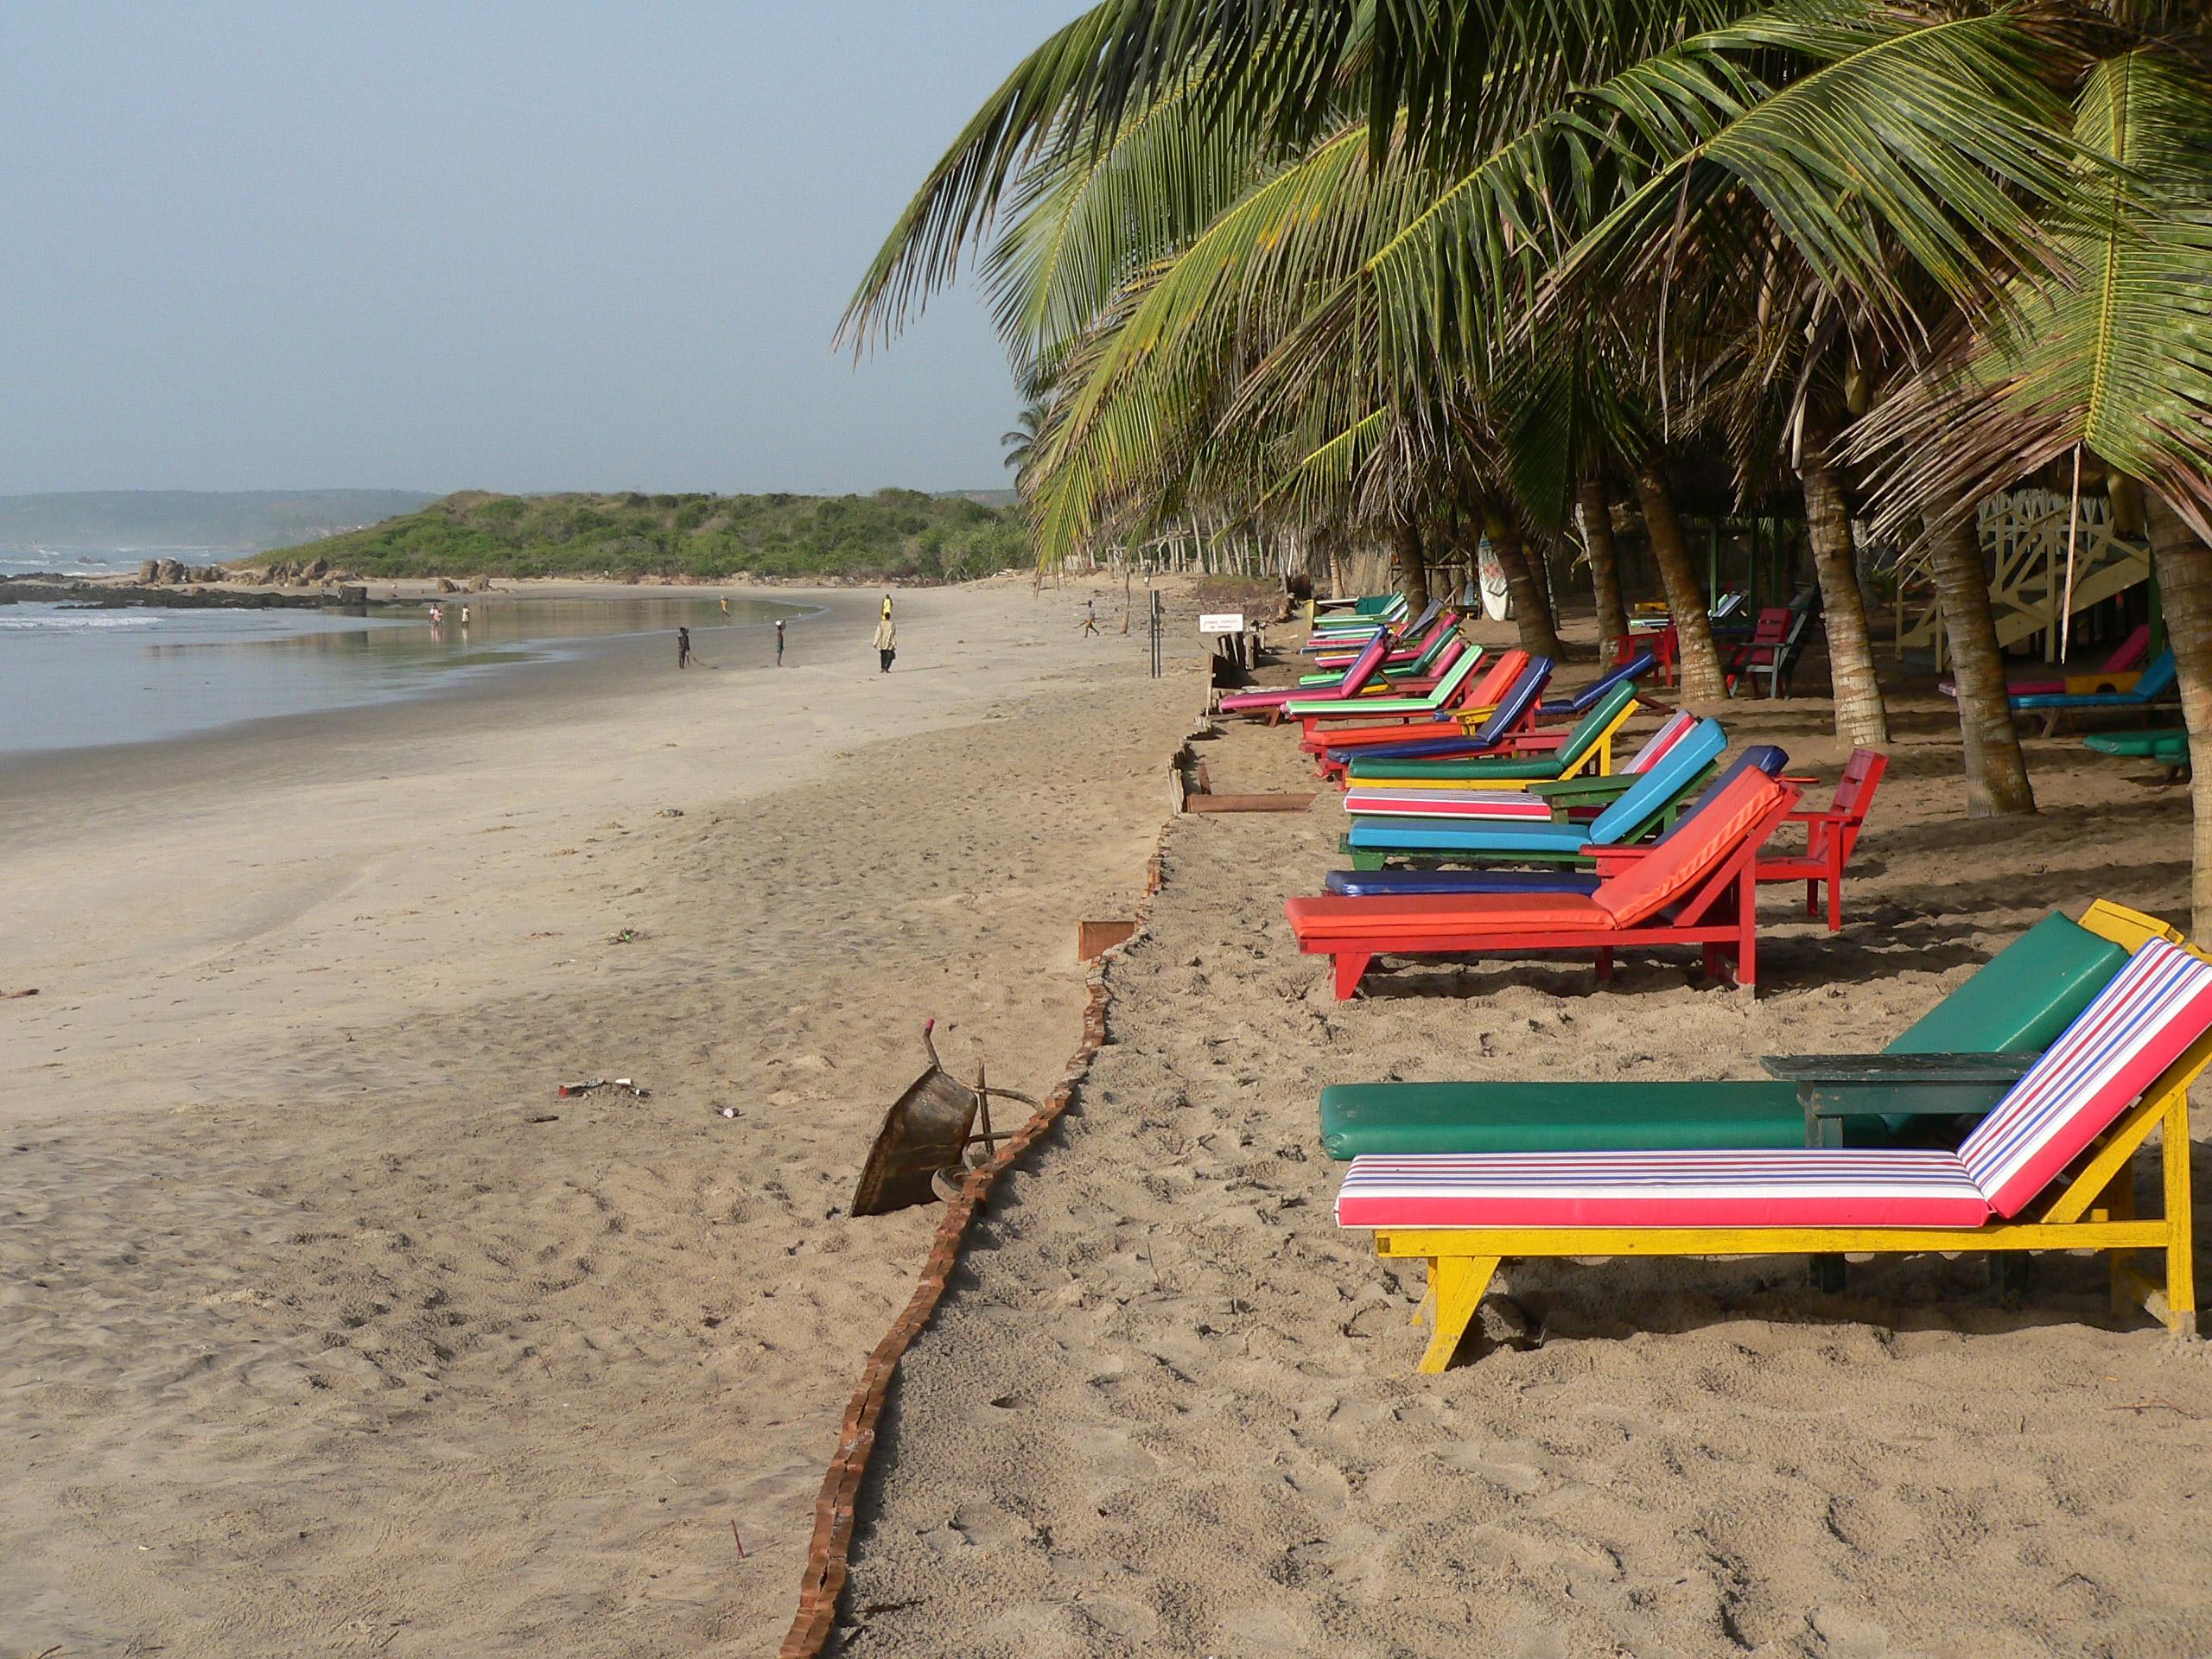 Filebeach Resort And Seaside Resort Setting In Central Region Ghana Jpg